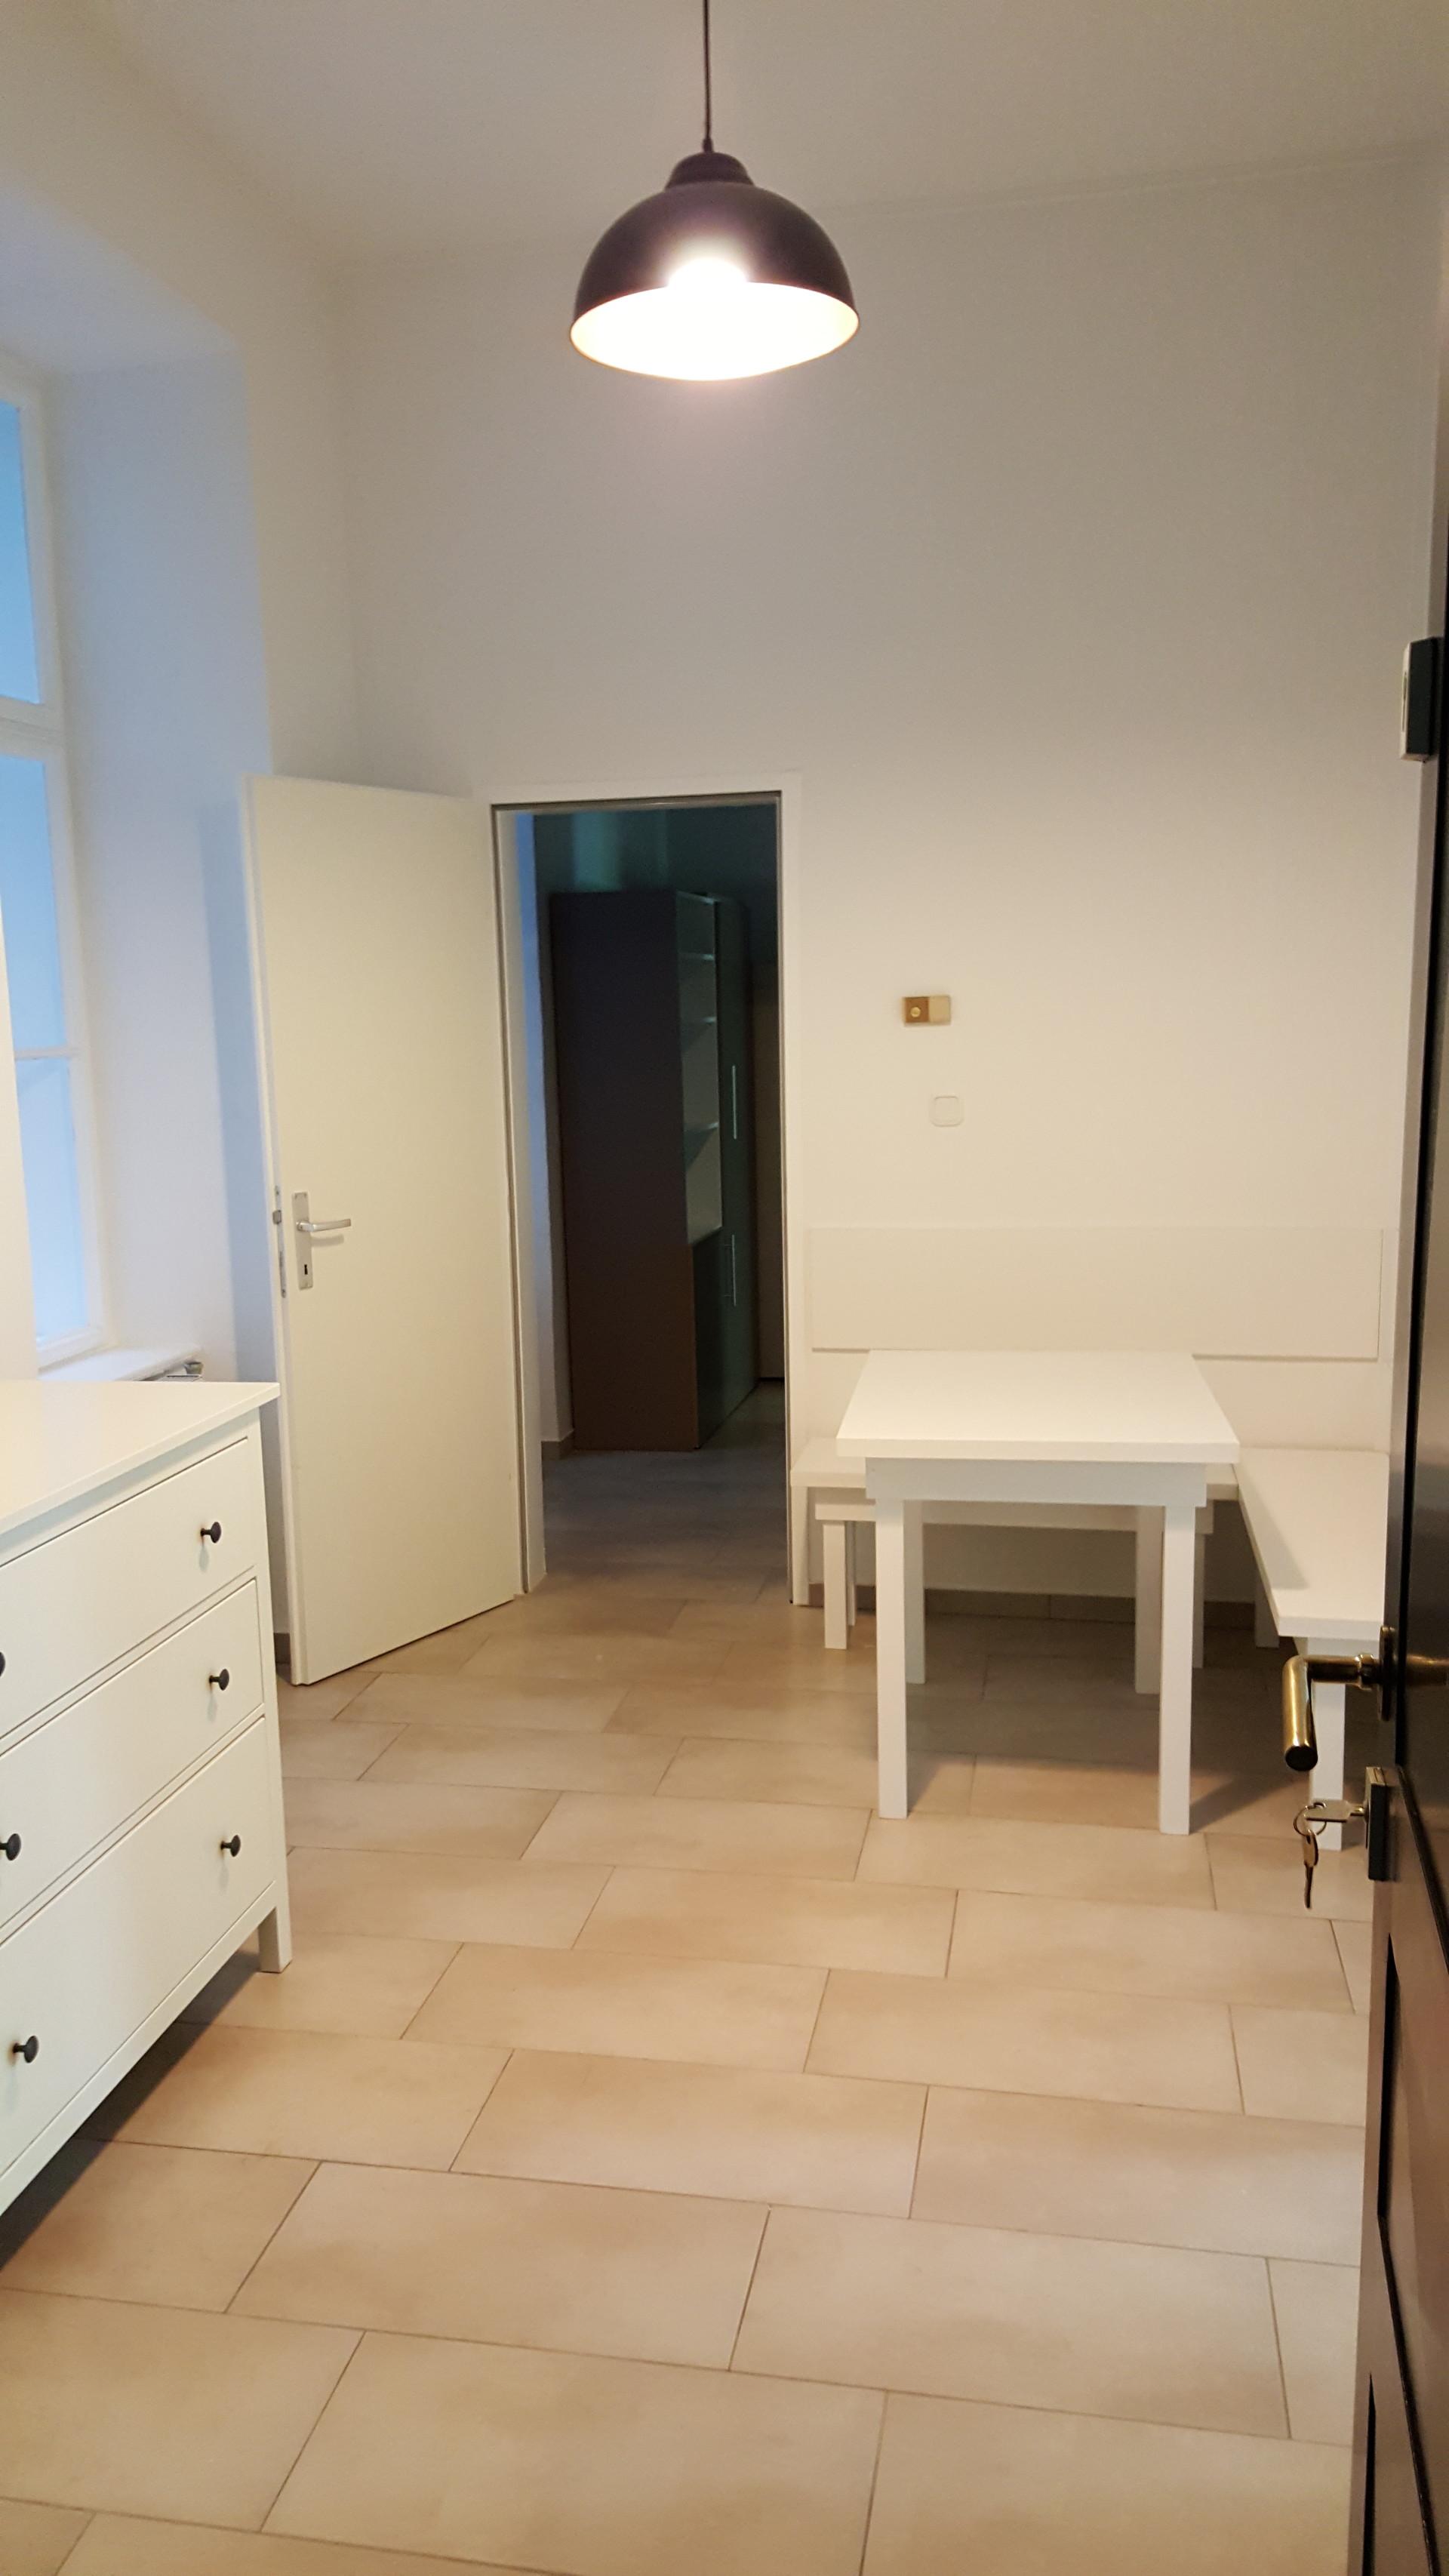 Blue & Green Stundet Studios - Neubau - 1070 Vienna | Room for rent ...